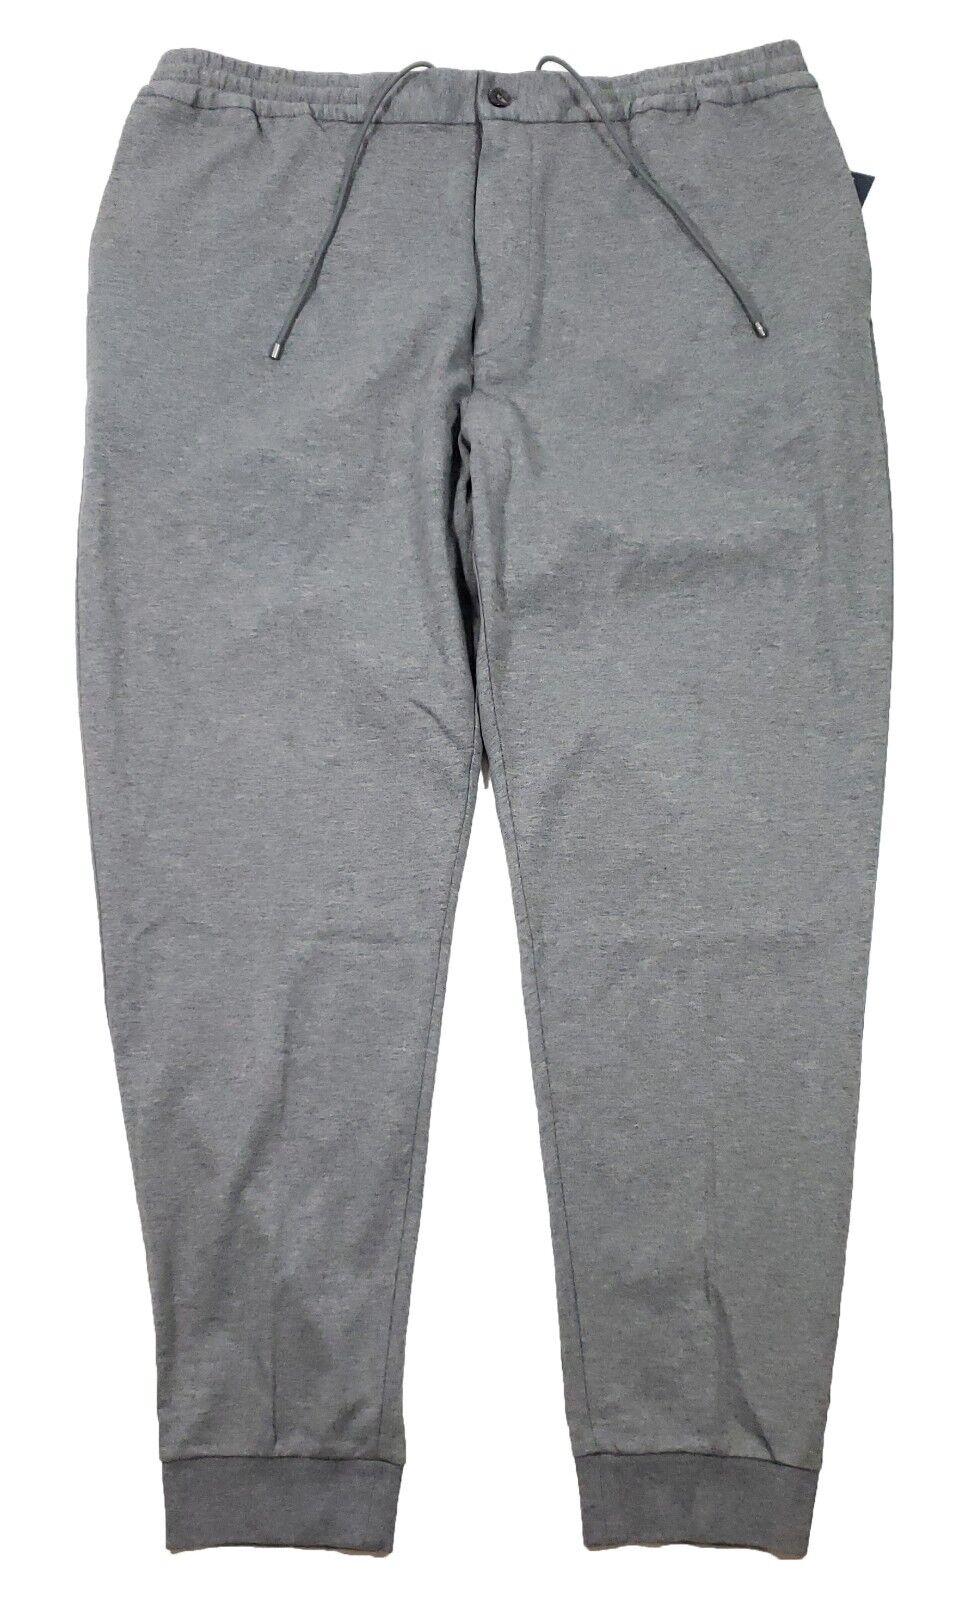 Polo Ralph Lauren Men's Foster Grey Dressy Jogger Pants